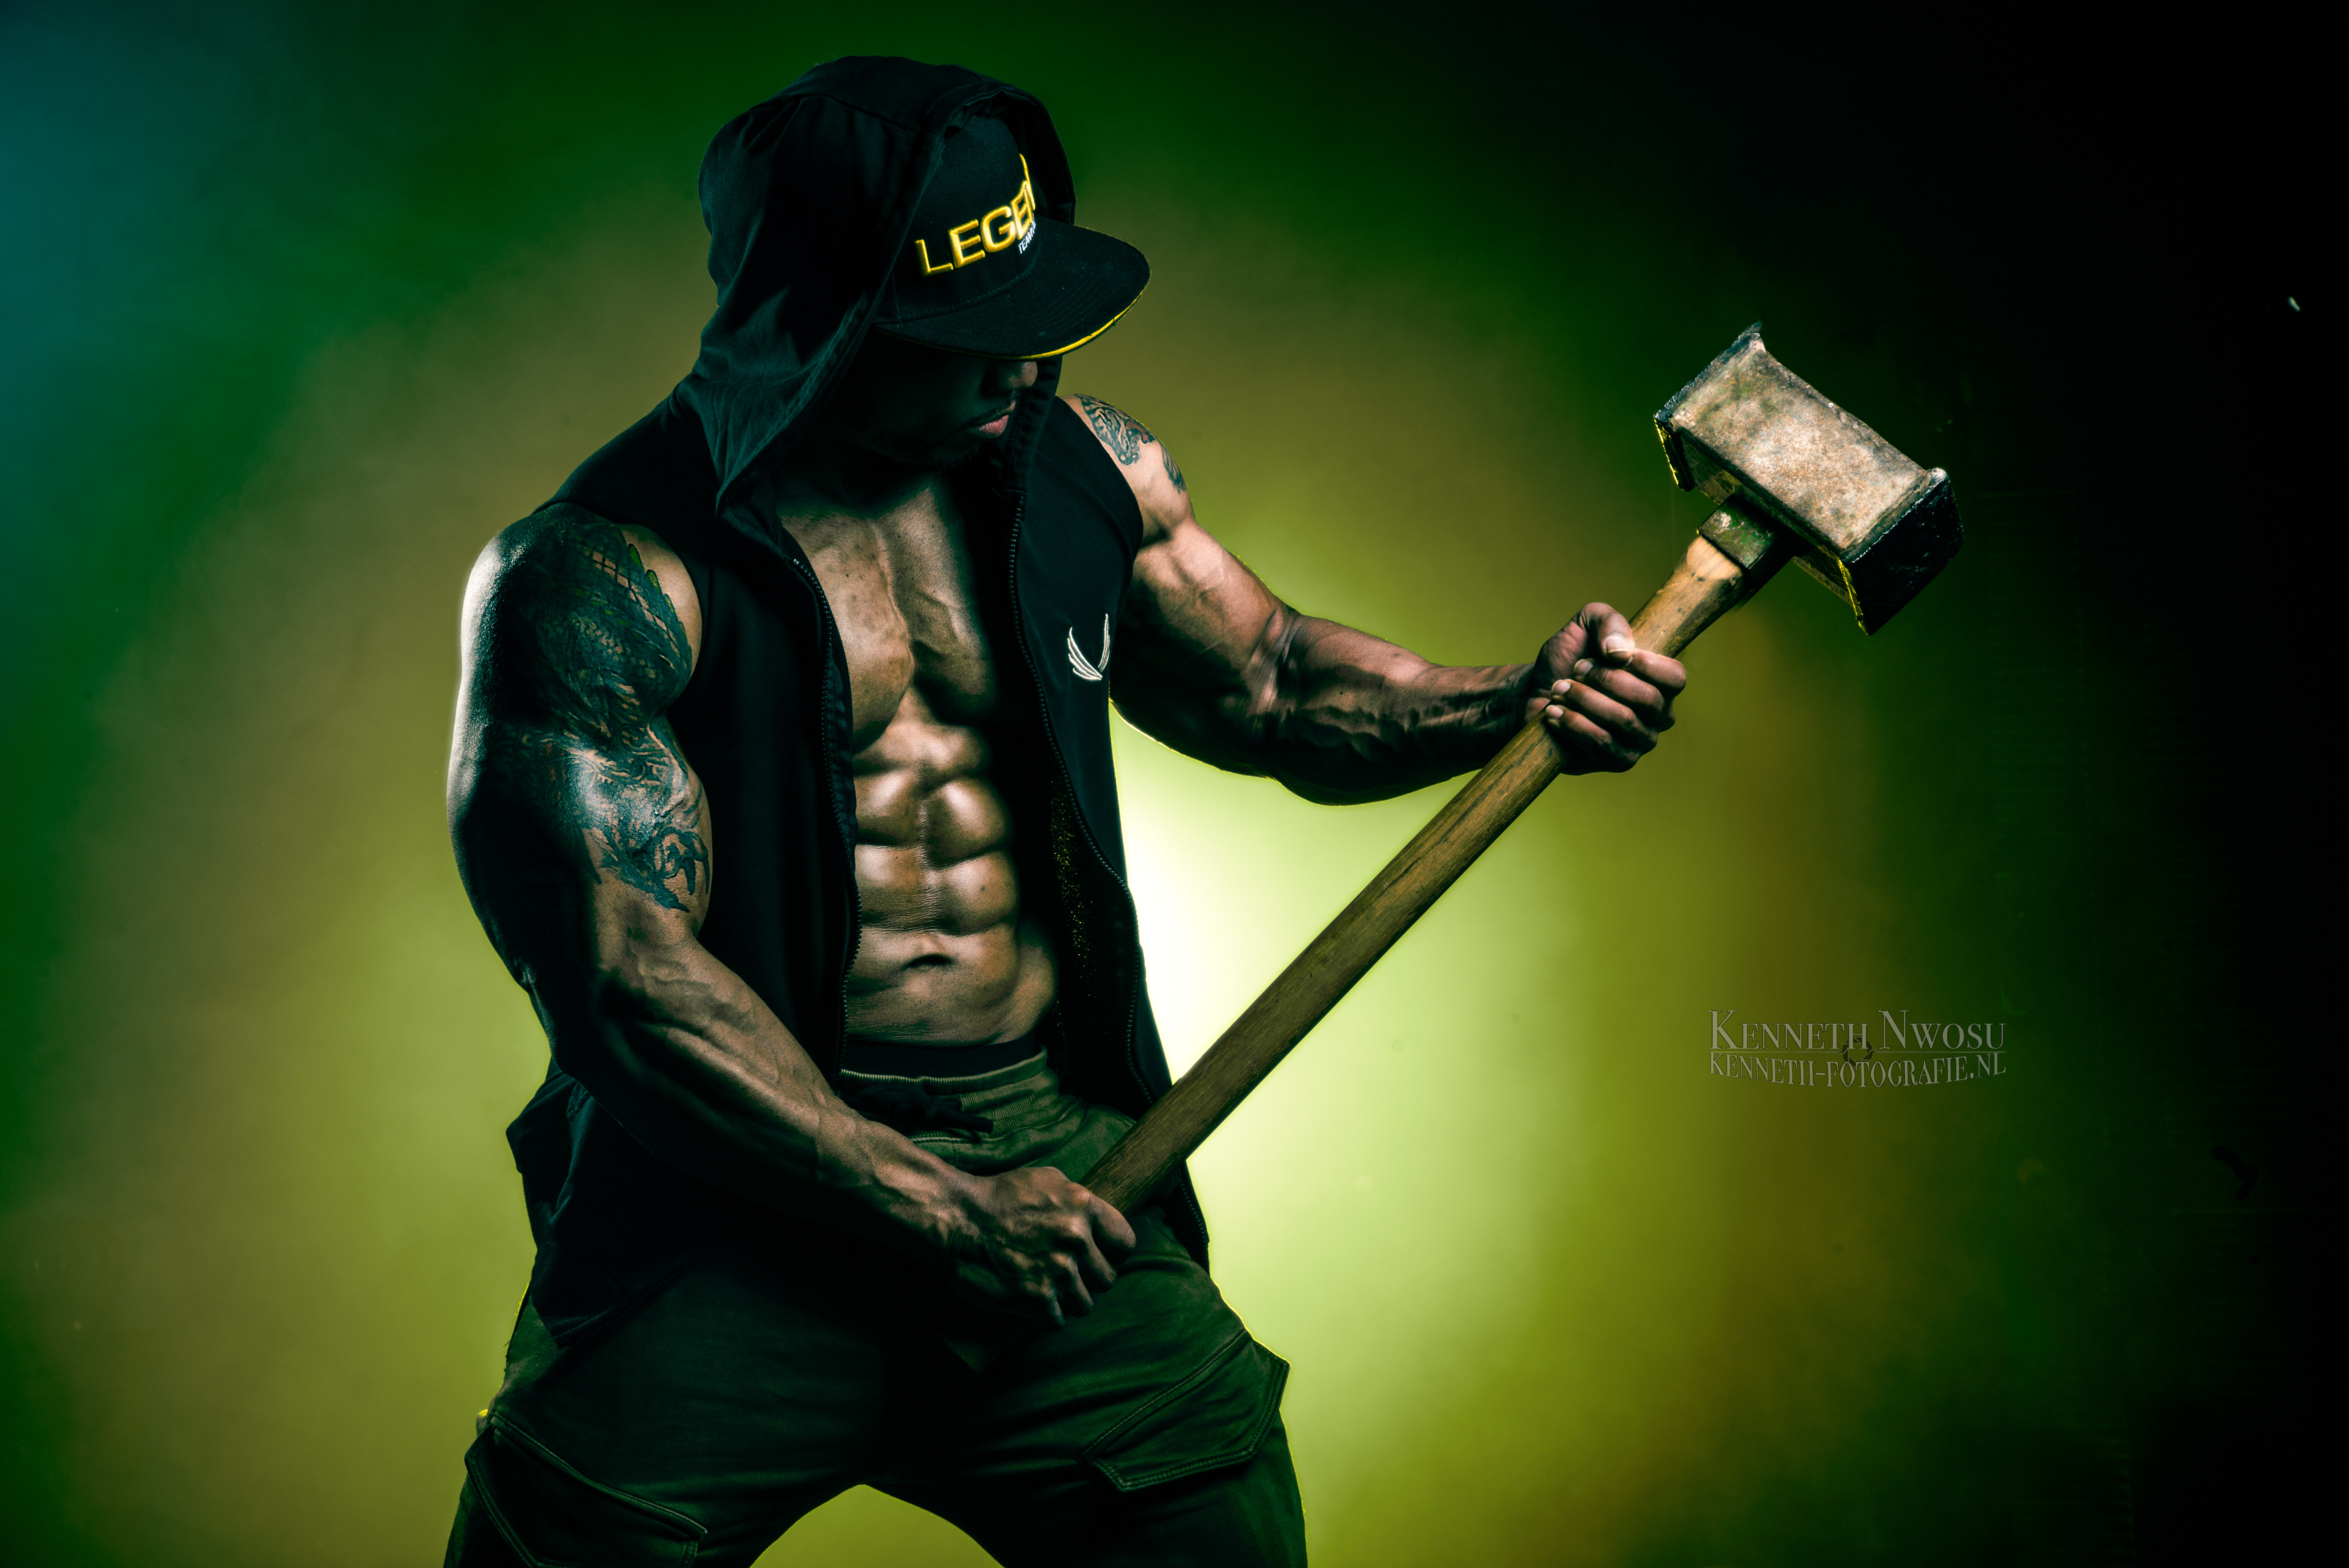 Gregory Melfor bodybuilding fotoshoot